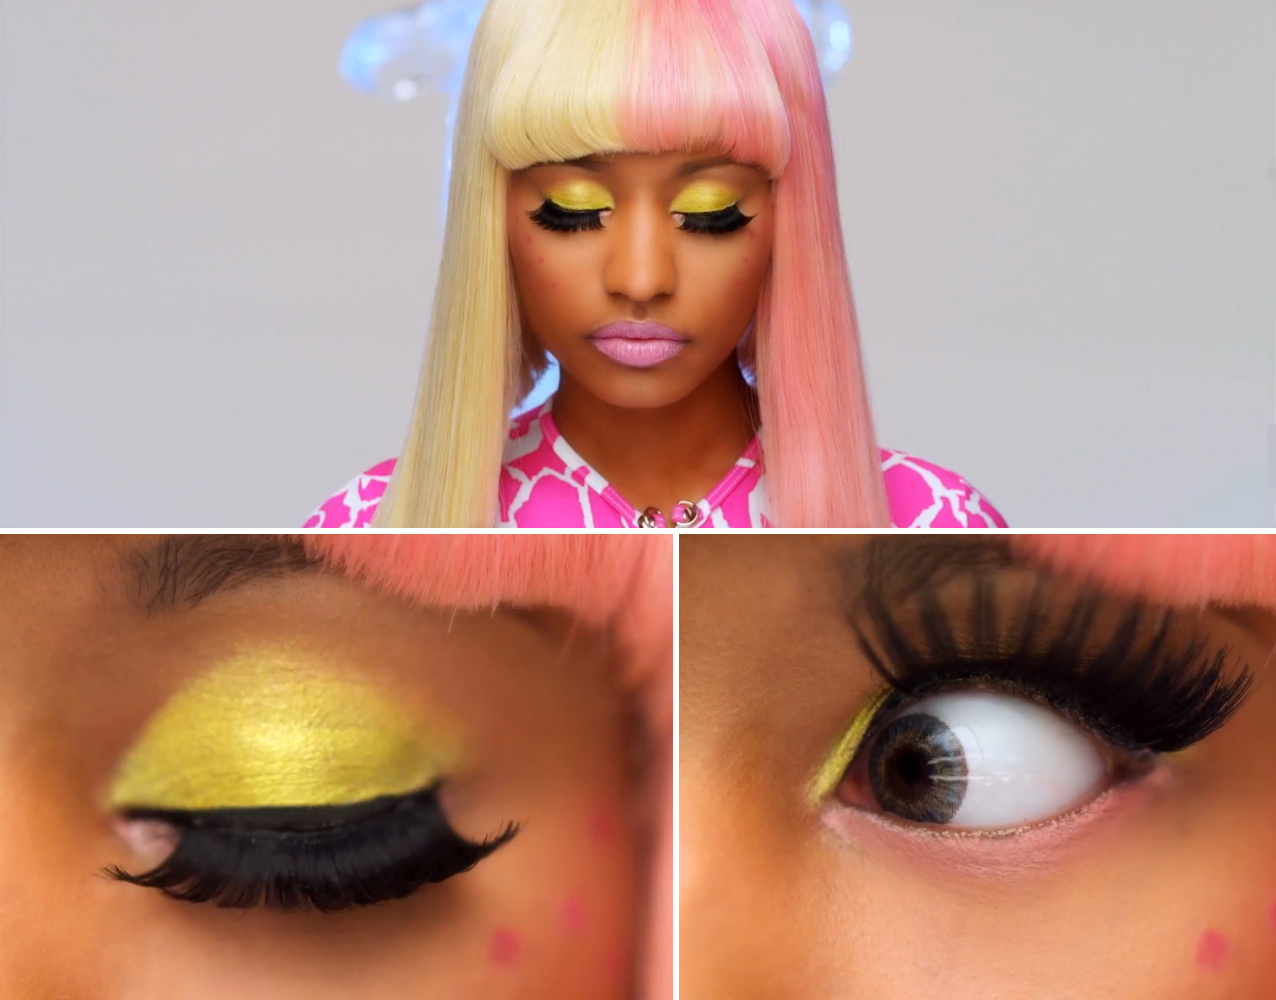 http://1.bp.blogspot.com/-RkFyhIhi51I/TuuA5Vq7OKI/AAAAAAAABfk/nPYeGCBLIbc/s1600/nicki+minaj+makeup-makeupmagazines.blogspot.com-minaj.jpg